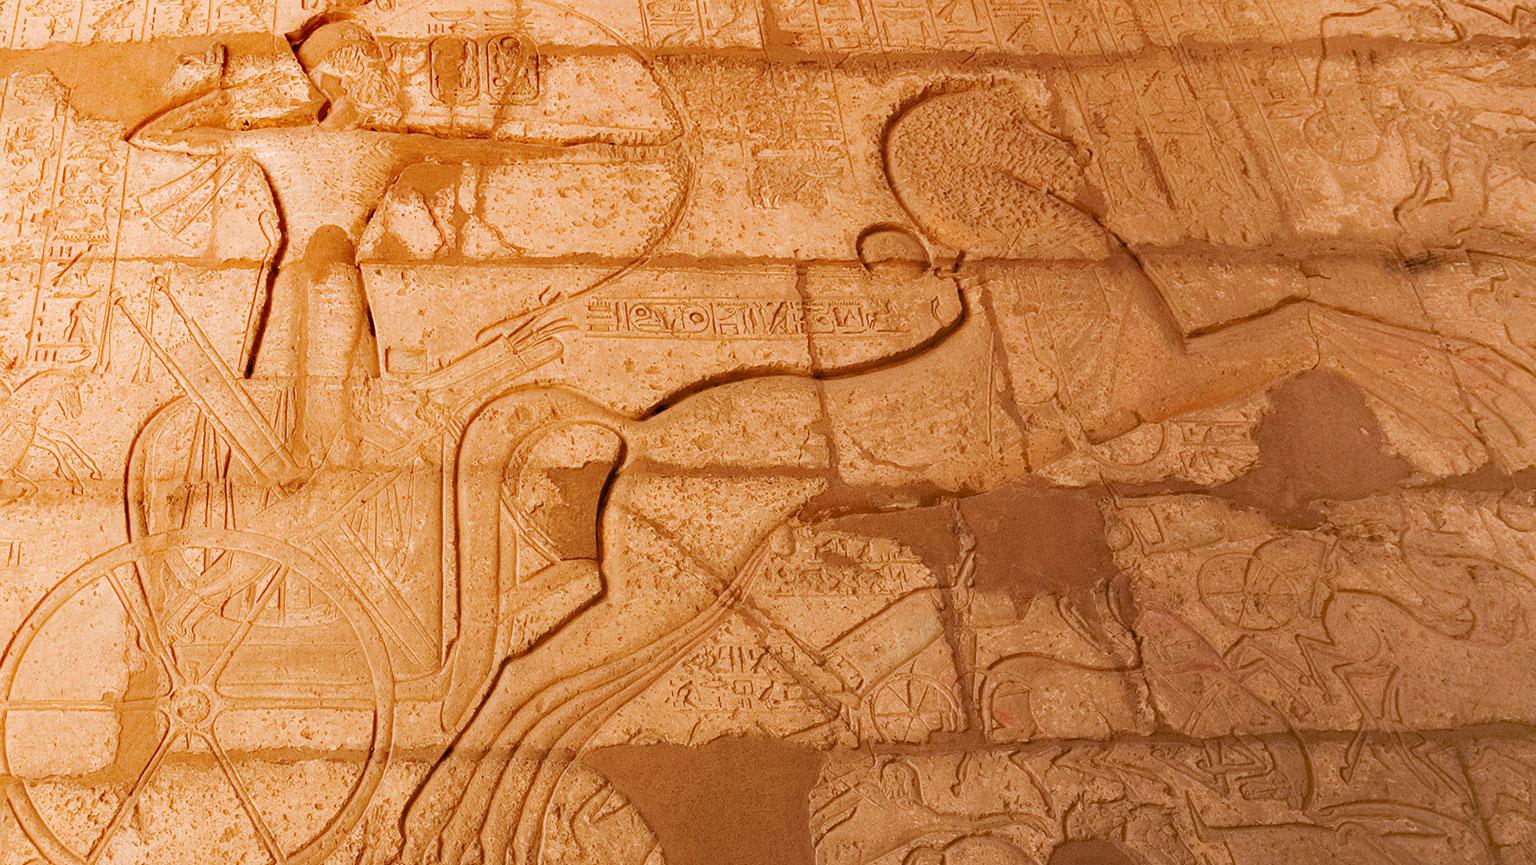 1274 B.C.  Kadesh—Greatest Chariot Battle